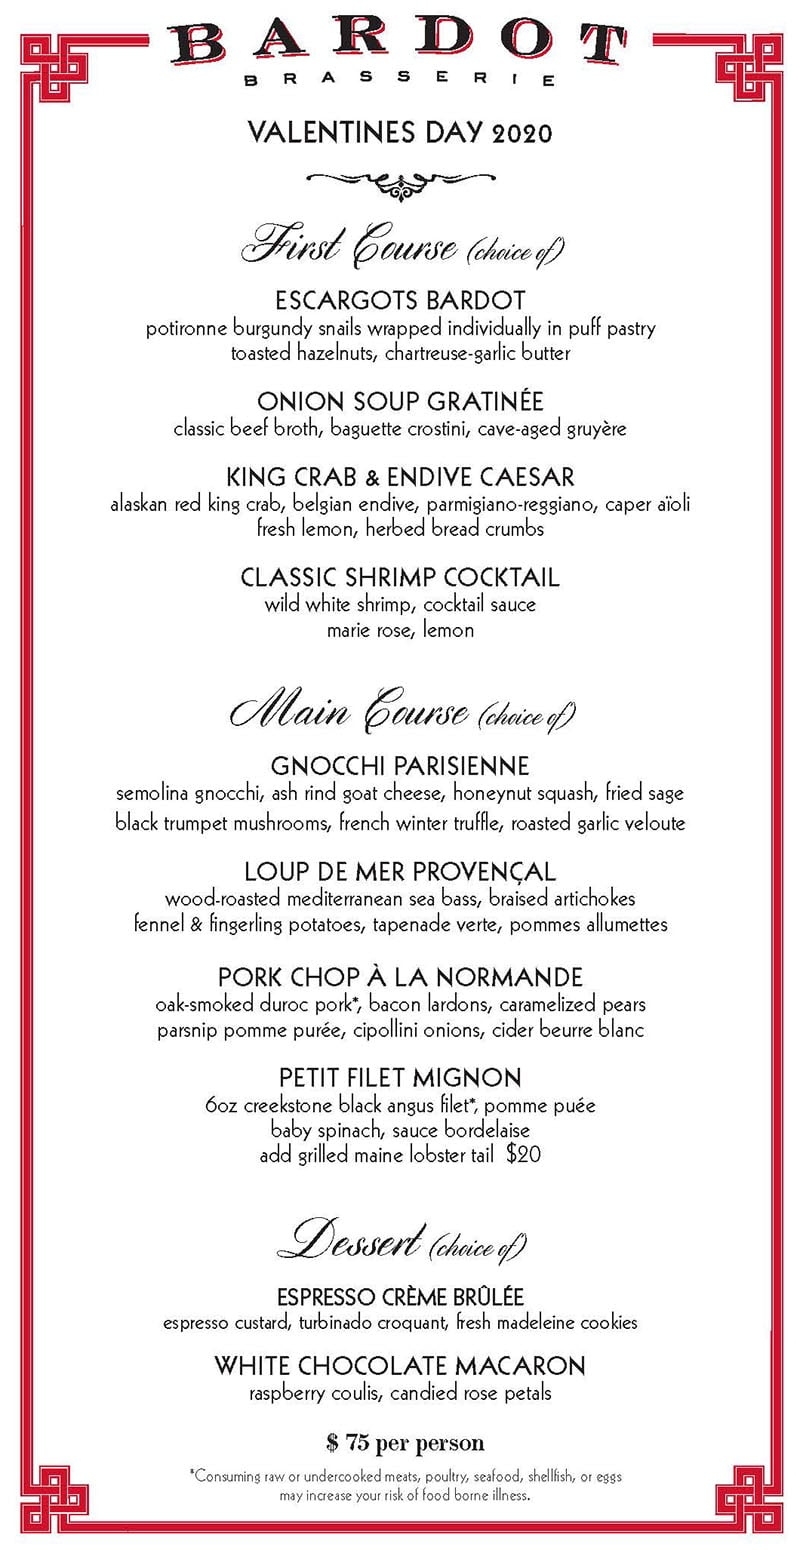 BARDOT Brasserie Valentines Day menu